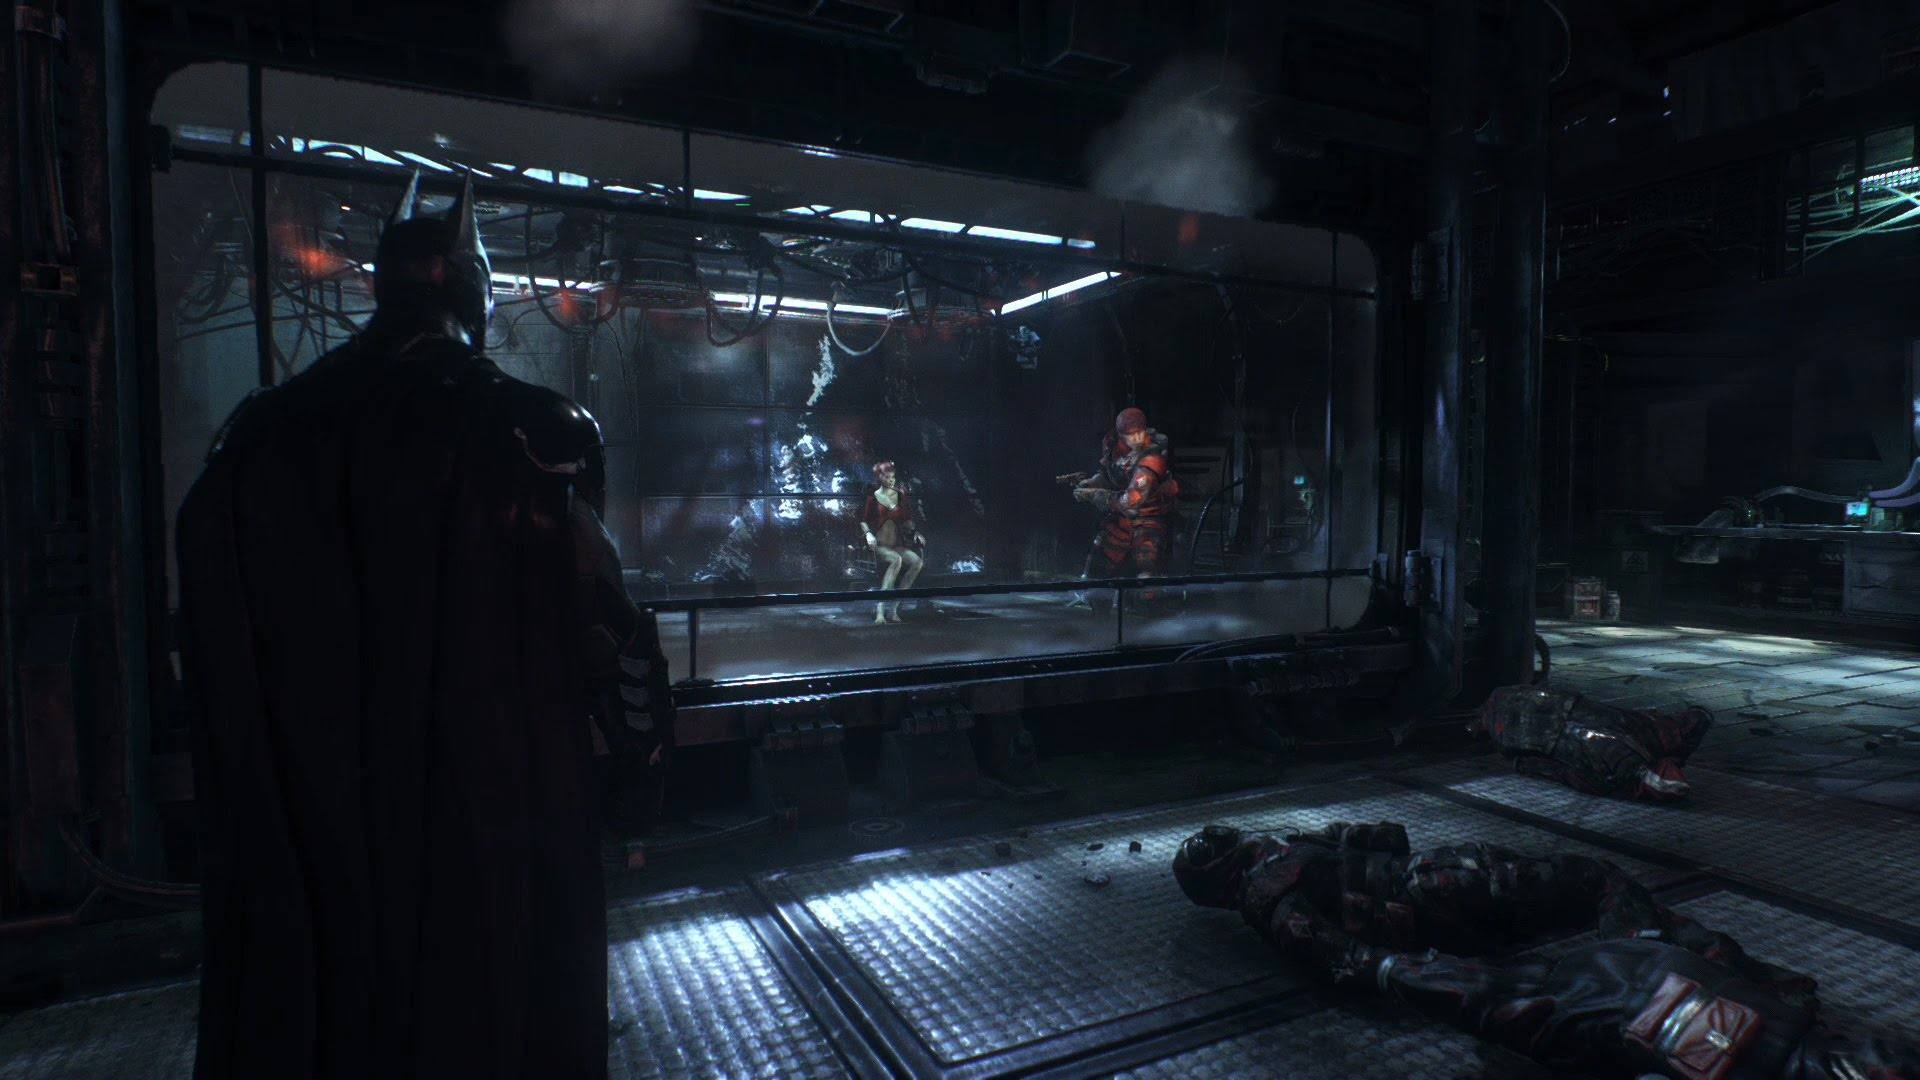 Video: 7 dakikada Batman: Arkham Knight oyun keyfi